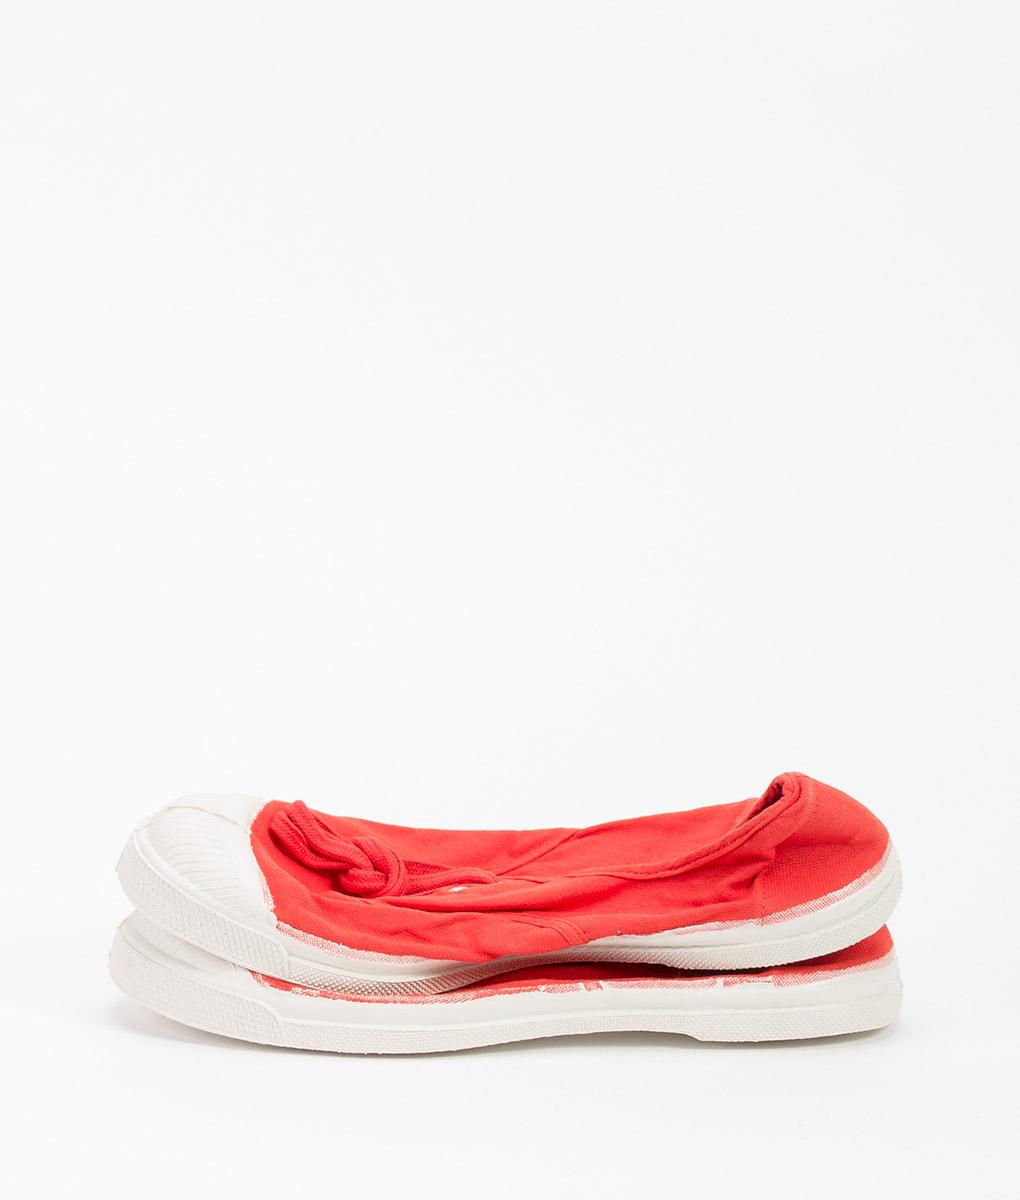 BENSIMON Women Sneakers 310 LACET Red 34.99